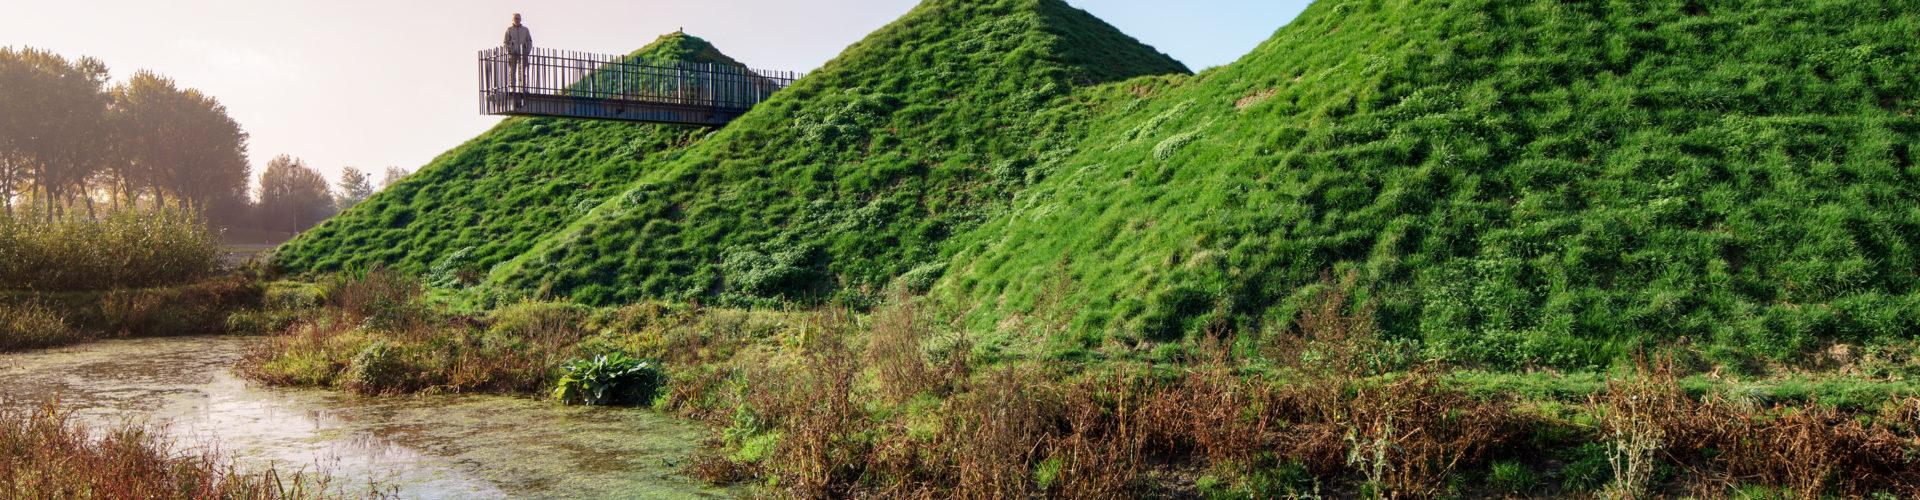 Loopbrug Biesbosch MuseumEiland